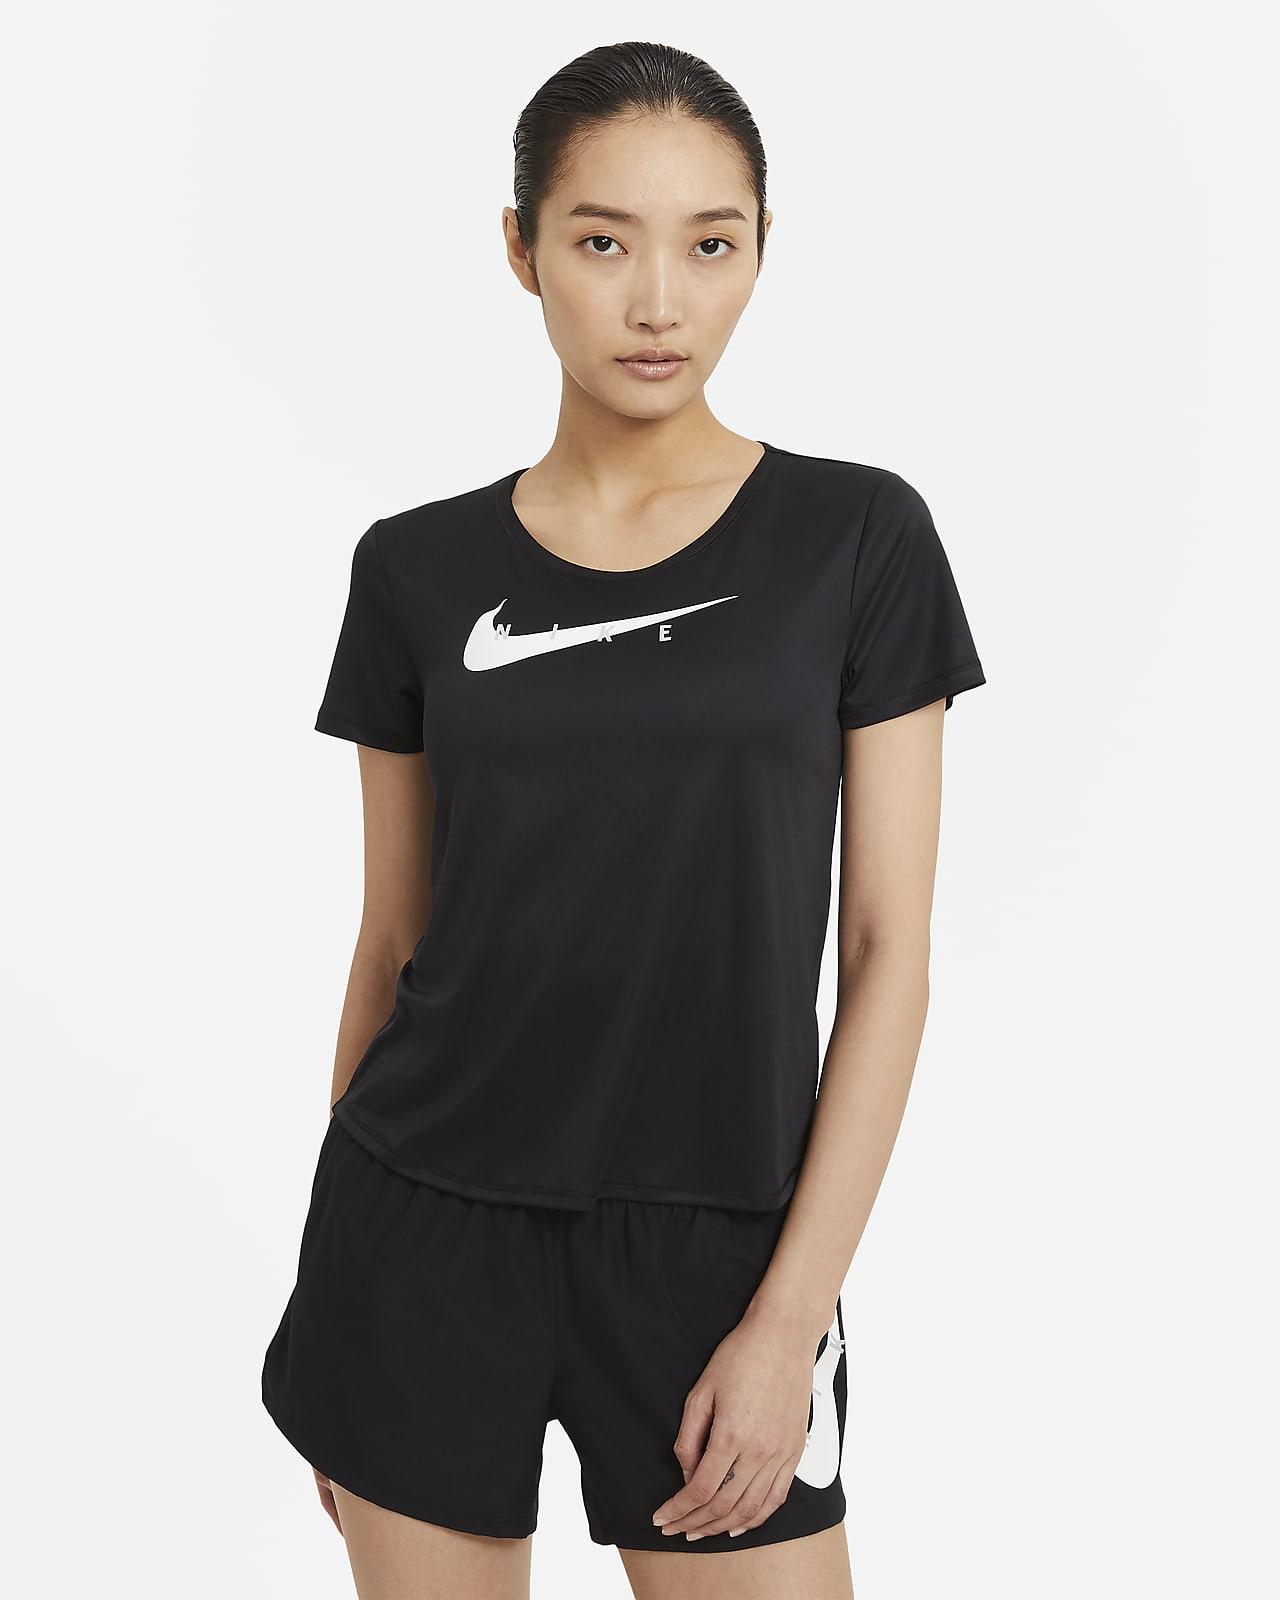 Nike Swoosh Run Women's Short-Sleeve Running Top